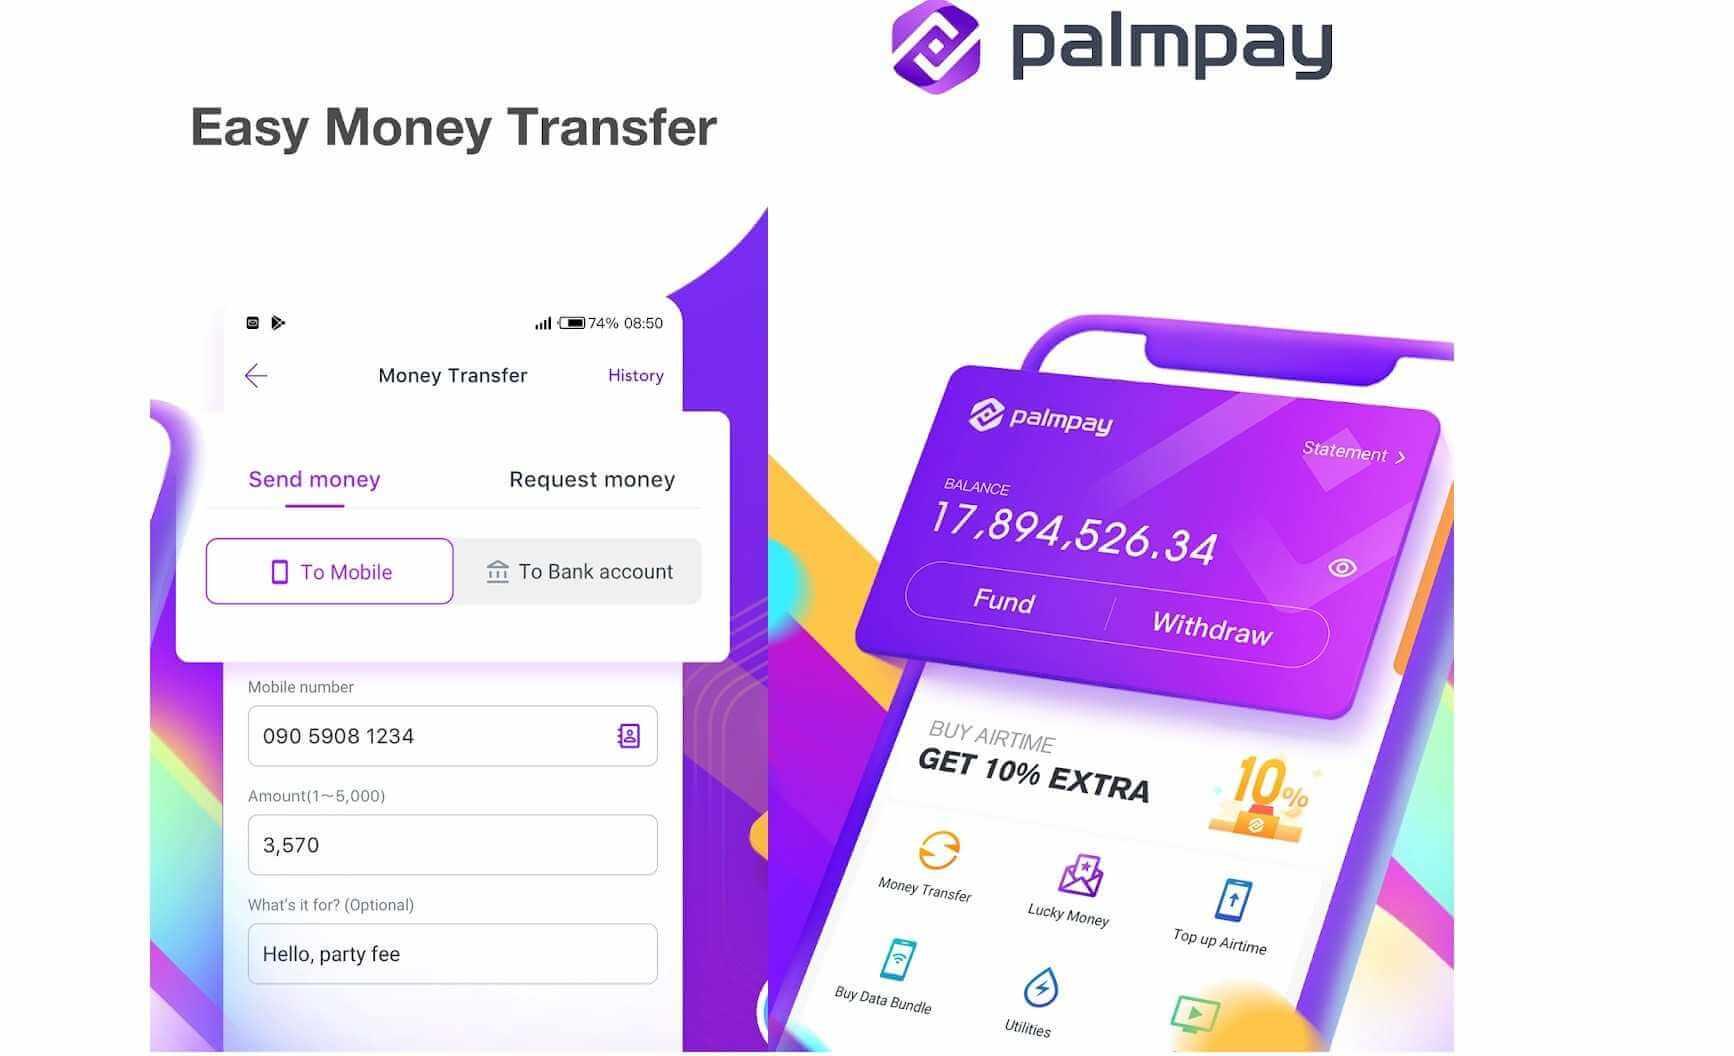 Palmpay uses 2